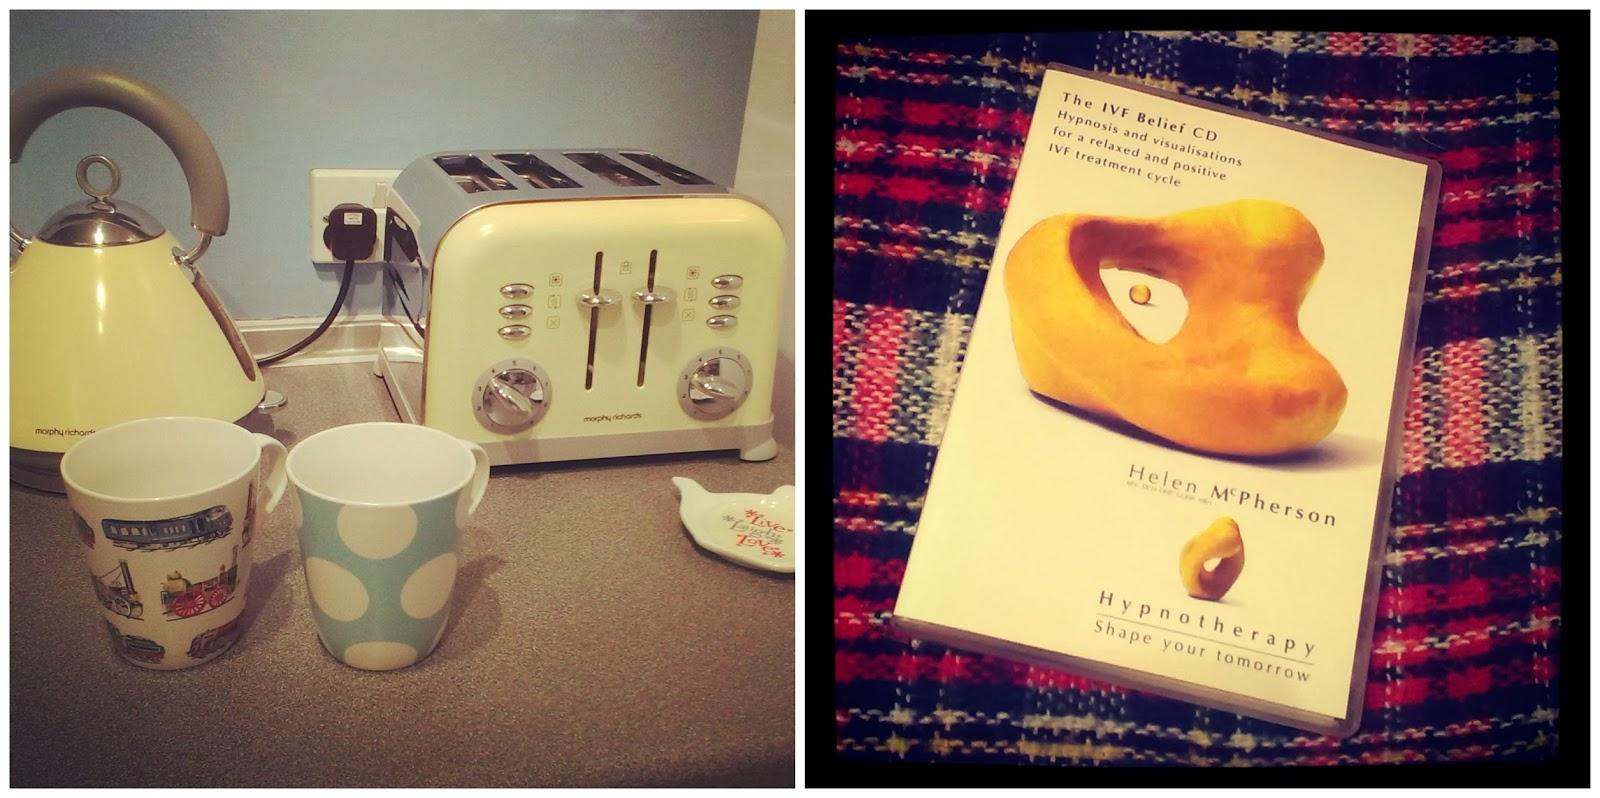 Hot drinks before bed - IVF Belief CD